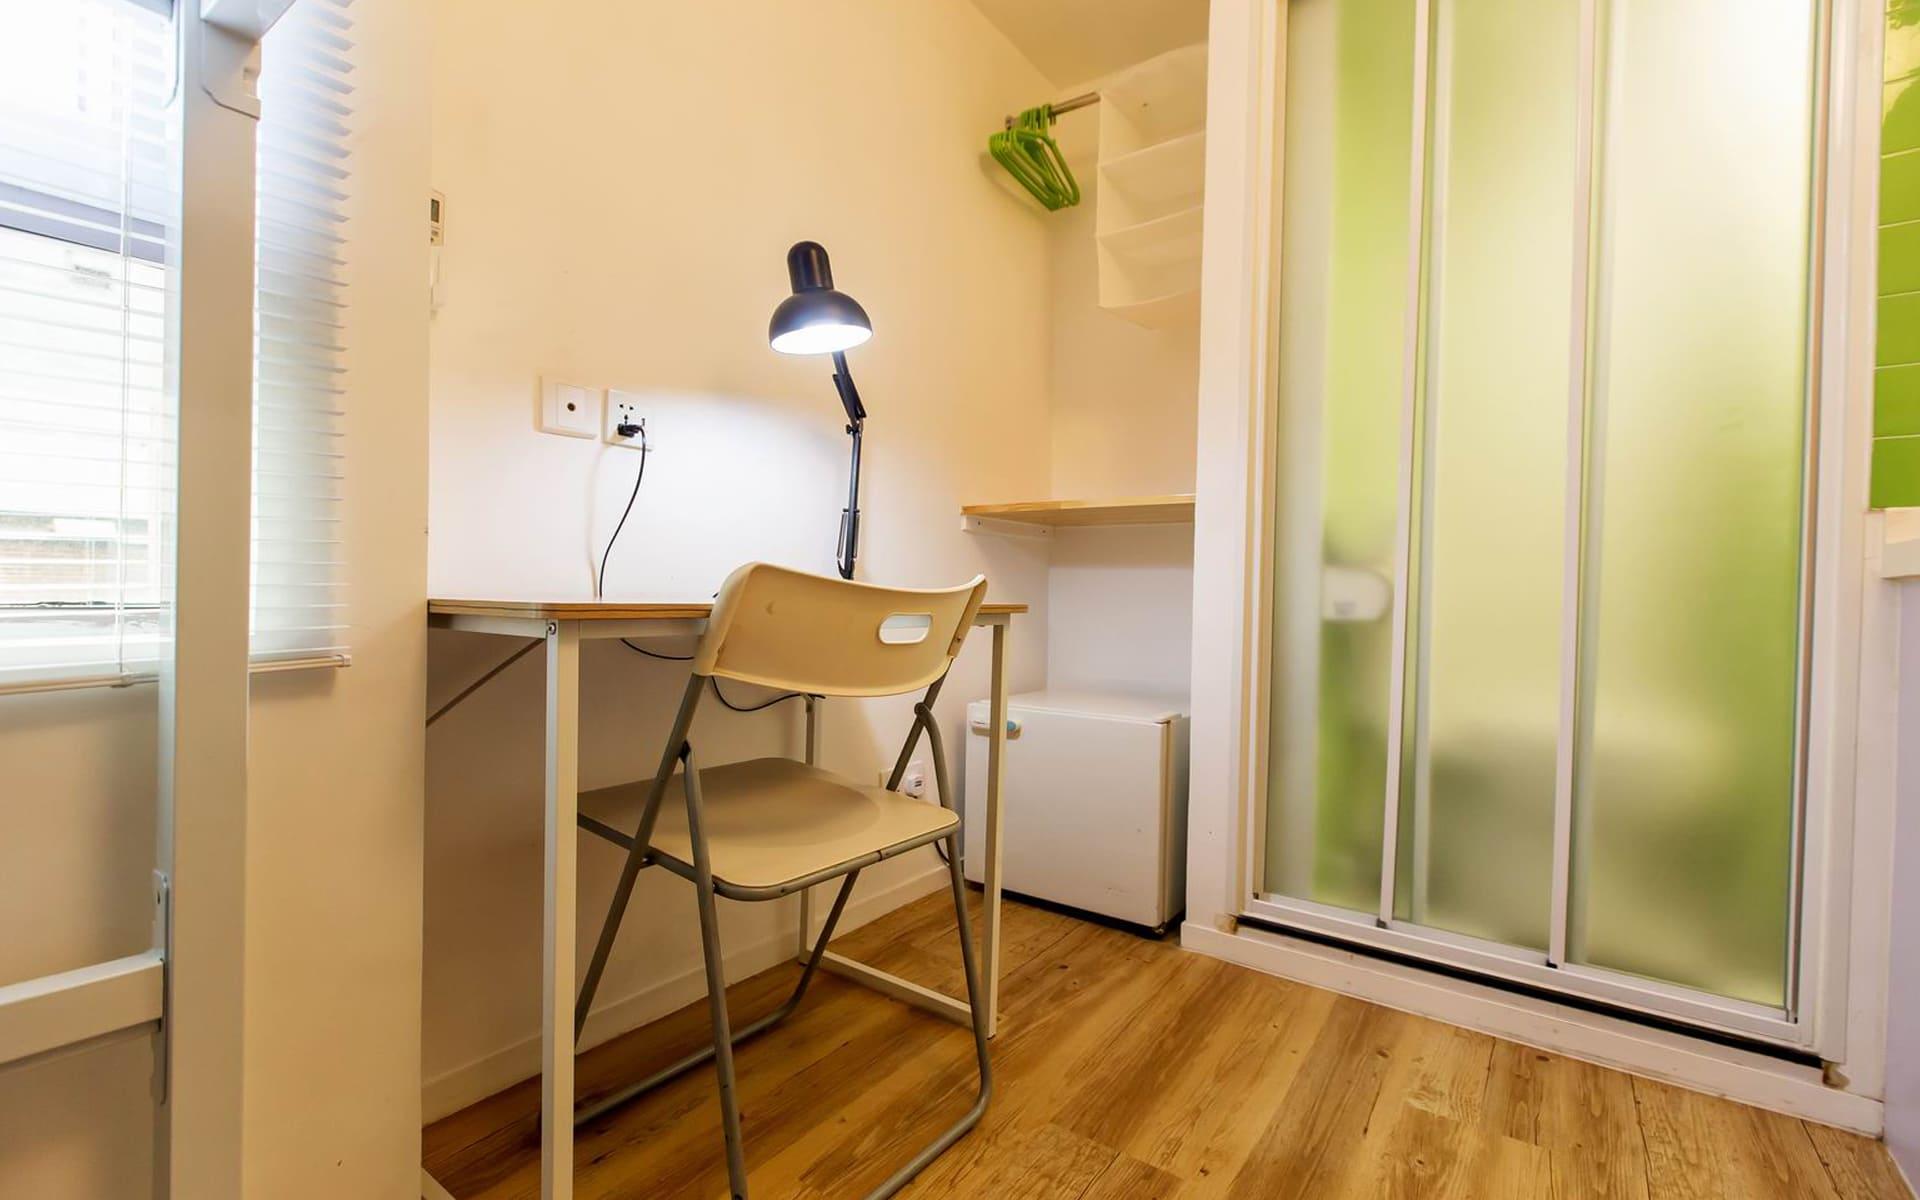 hk_service_apartment_17286397931580801755.jpg